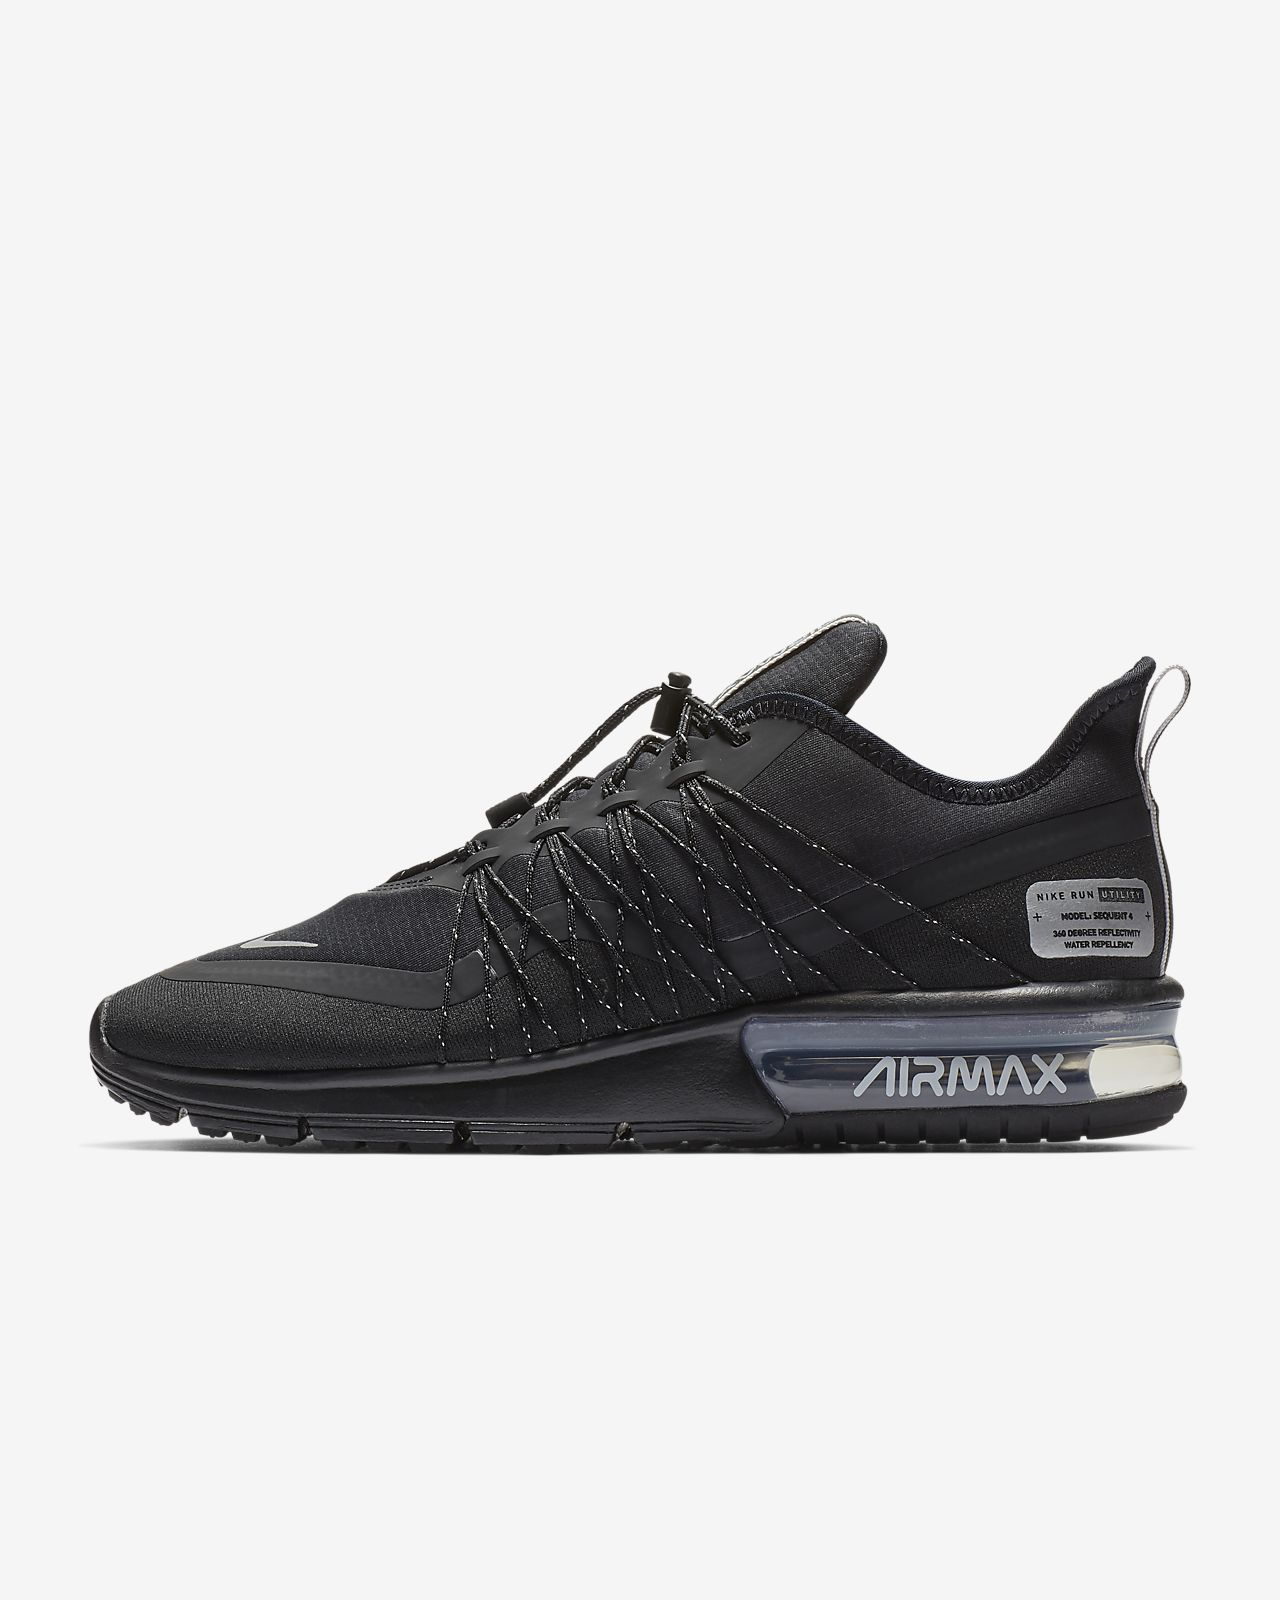 NikeAir Max Sequent 4 Utility女子运动鞋